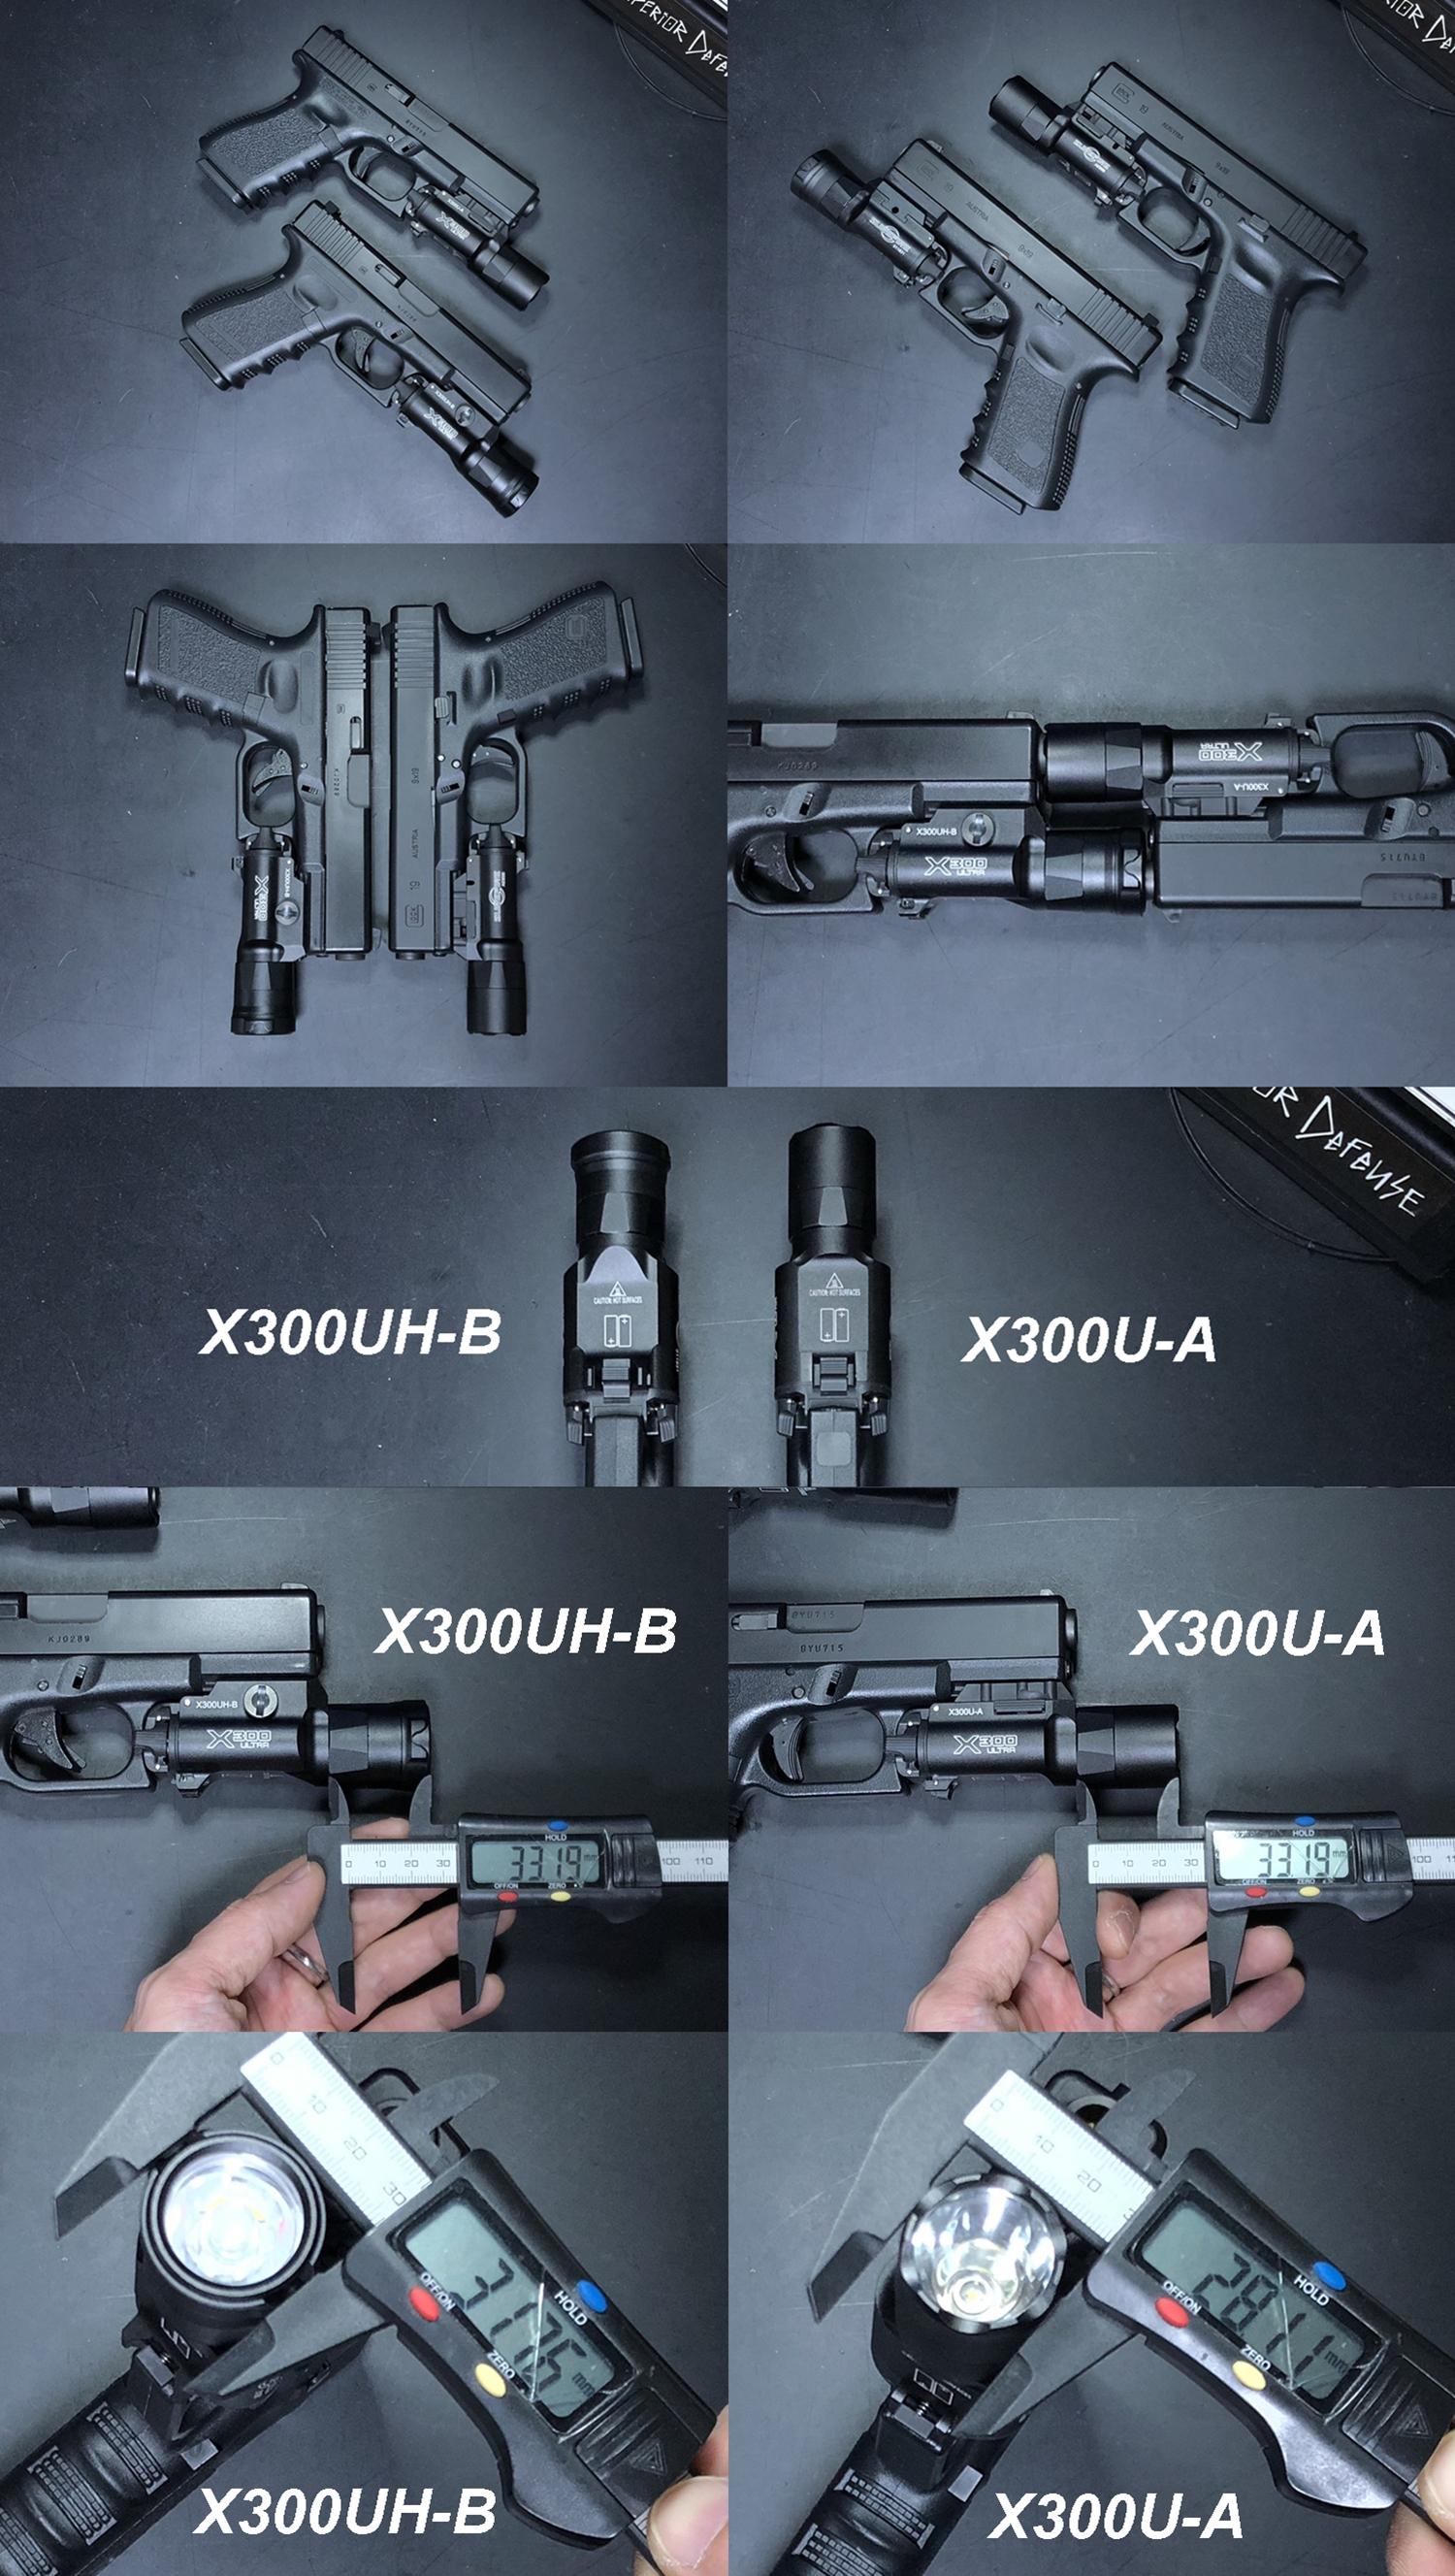 11 SOTAC GEAR SUREFIRE X300UH-B TYPE GET!! G19カスタム用に 実物 X300U-B が欲しかったけど…我慢! X300 シリーズ レプリカ シュアファイア! 購入 開封 比較 検証 取付 レビュー!